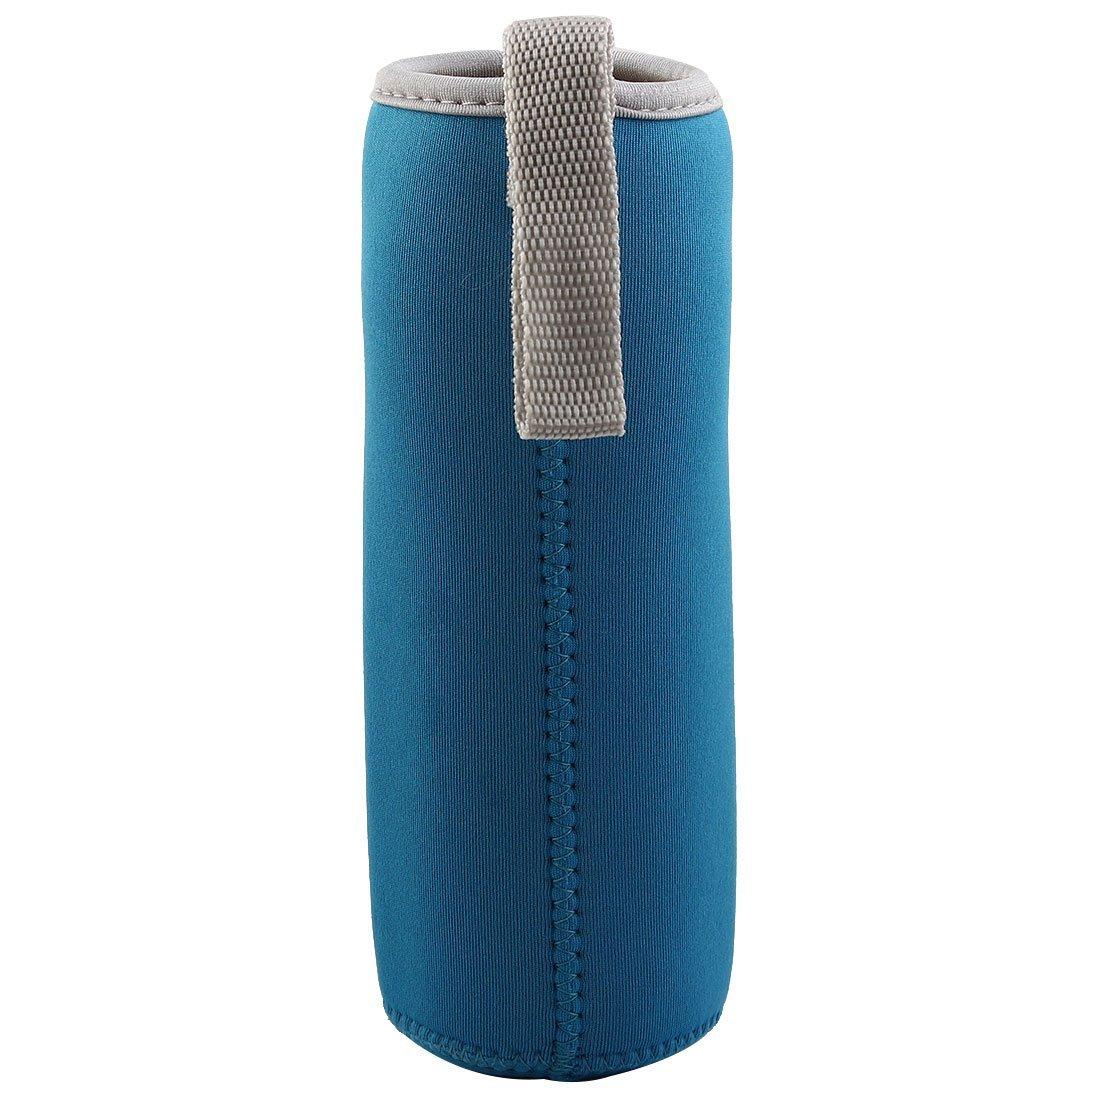 Amazon.com: eDealMax Spandex Inicio aislamiento térmico protector anti escalda Manos taza de cristal taza azul de la manga: Kitchen & Dining